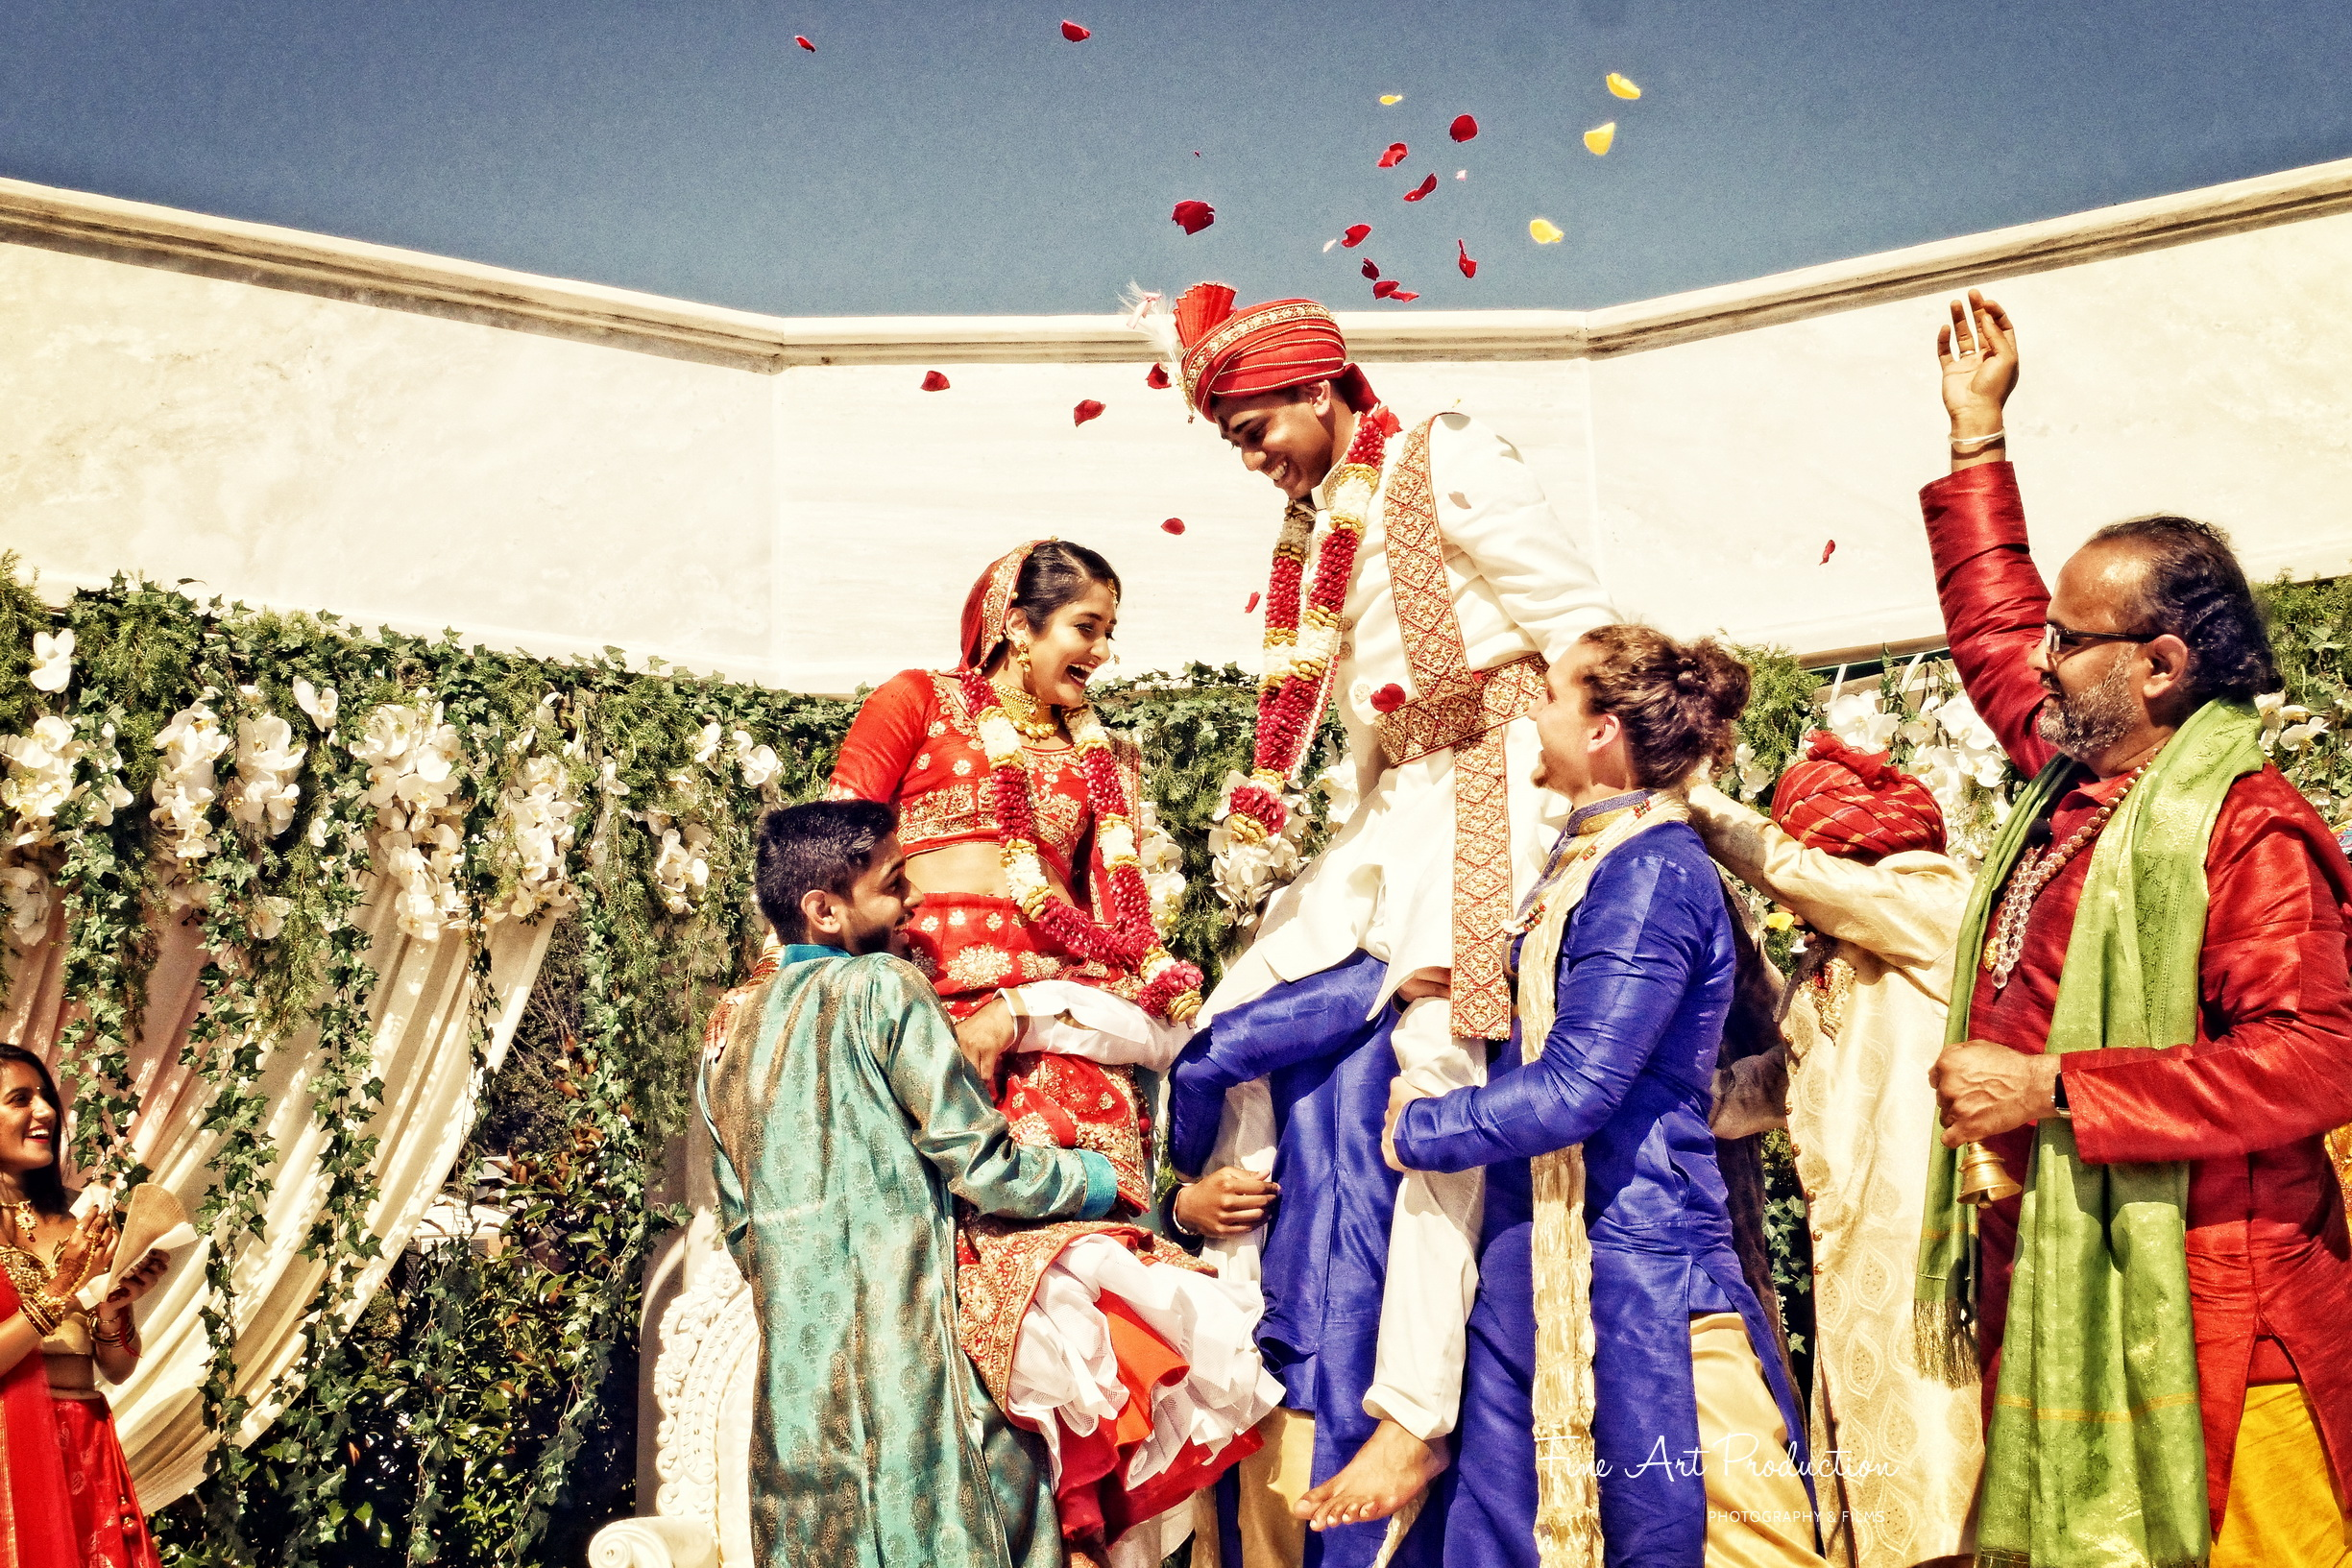 india-wedding-photographer-fine-art-production-chirali-amish-thakkar_0050